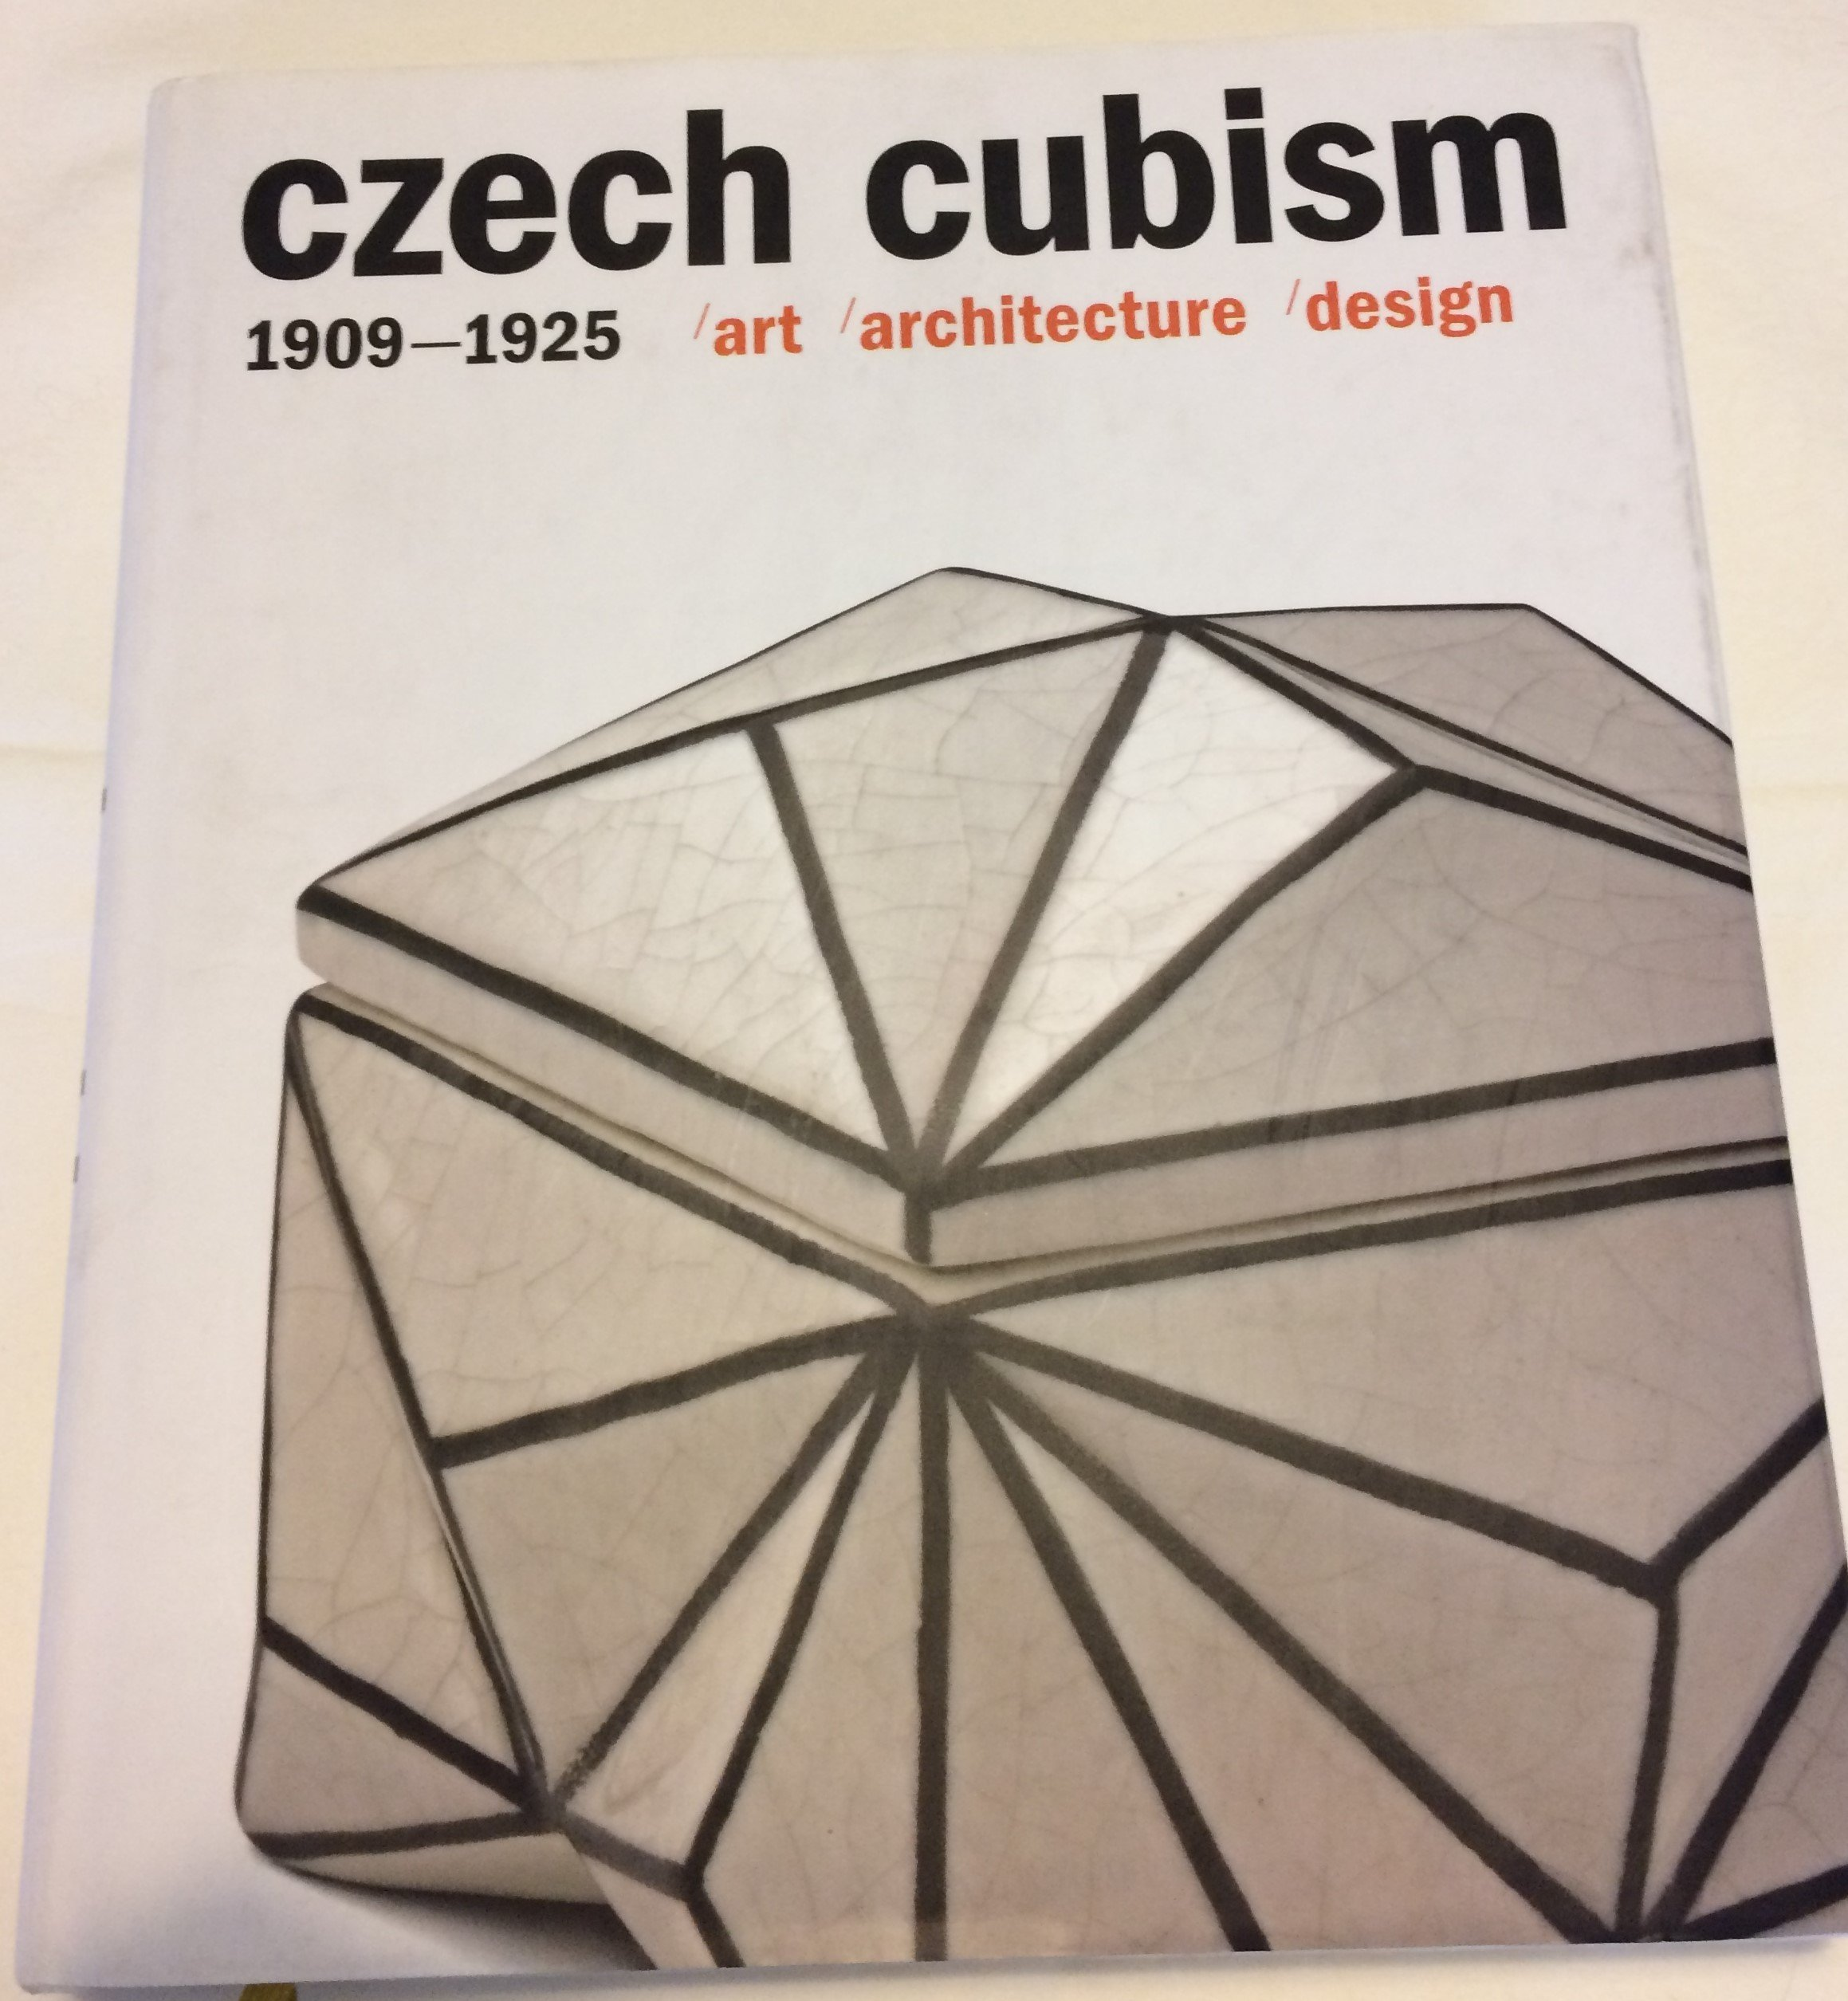 Download By Jiri Svestka, Tomas Vlcek Pavel Liska CZECH CUBISM 1909-1925 (art - architecture - design) [Hardcover] pdf